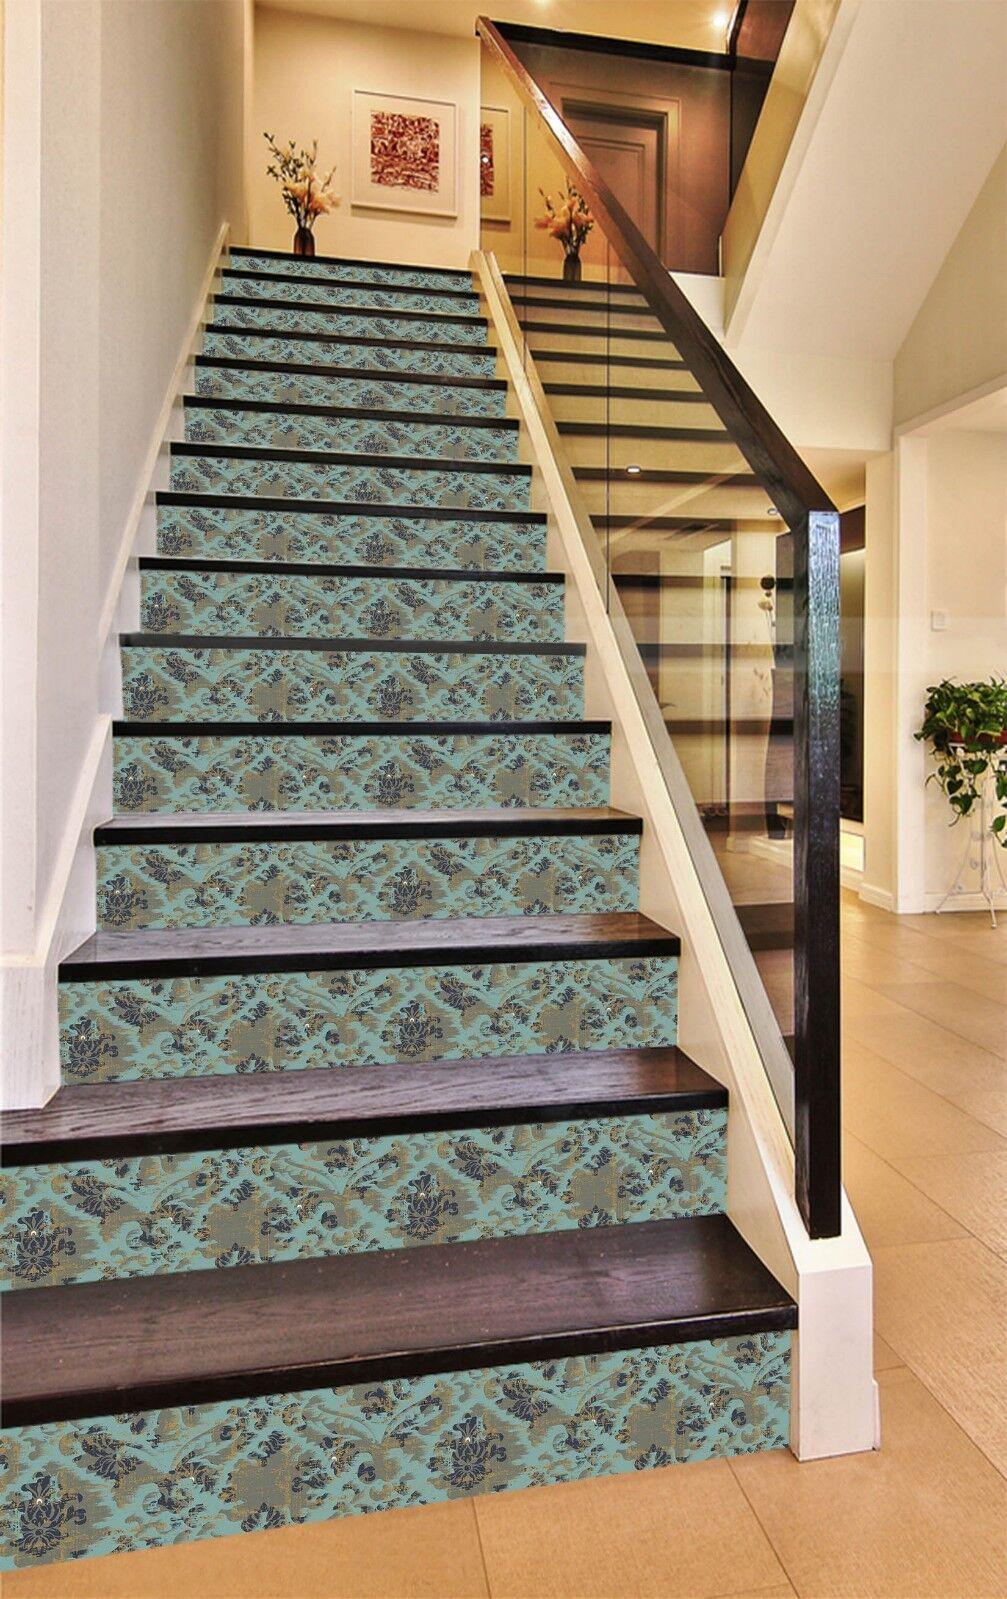 3D Cyan Flower 75 Tile Marble Stair Risers Photo Mural Vinyl Decal Wallpaper